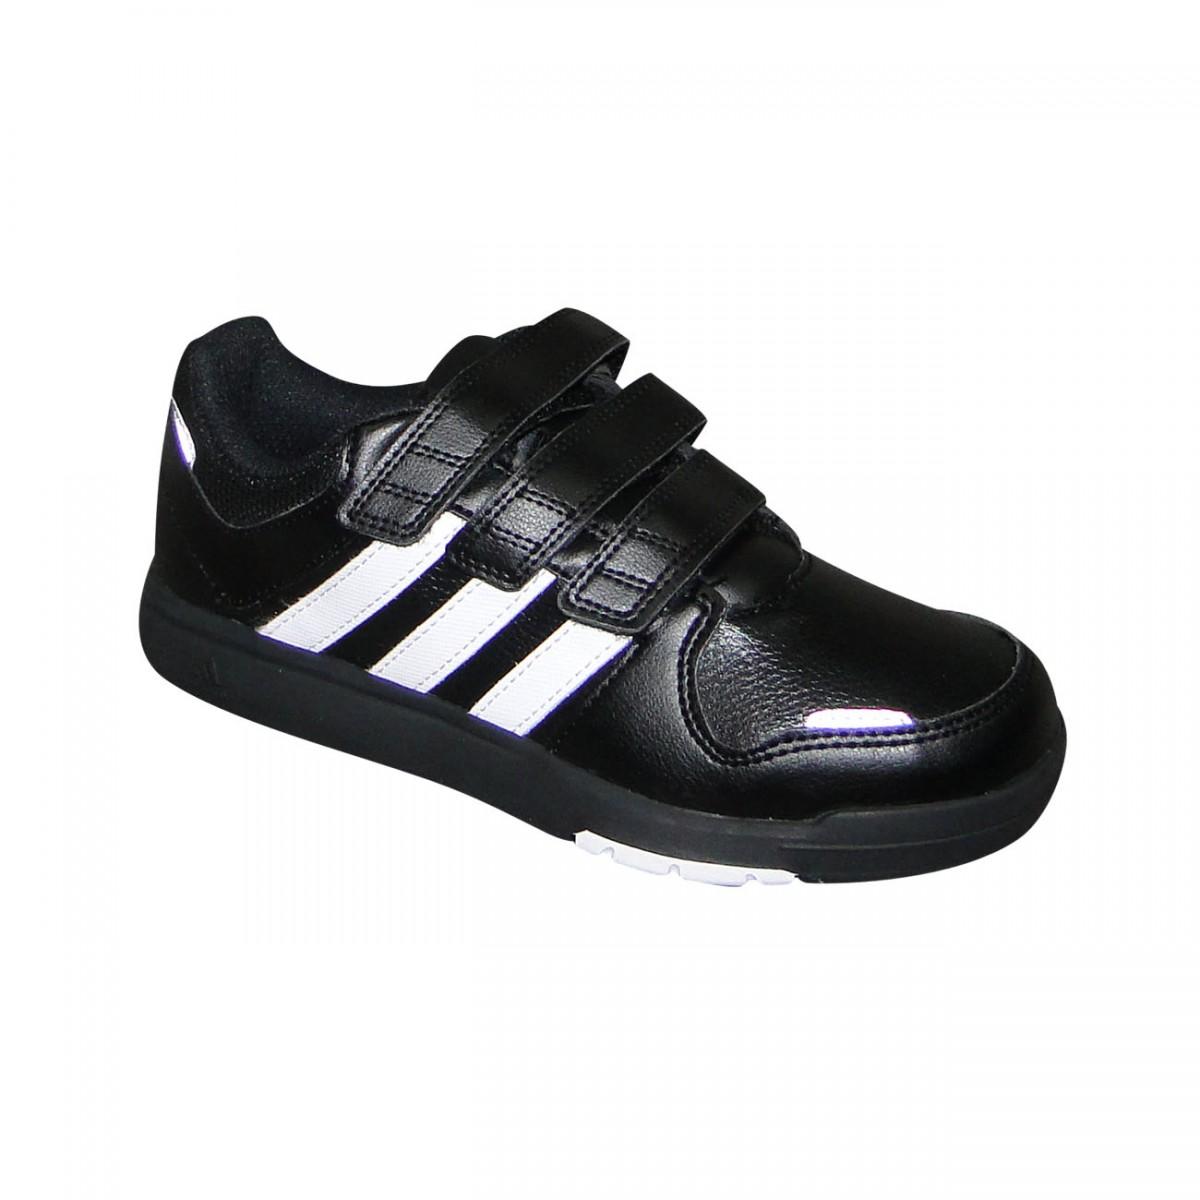 77e5335a93c Tenis Adidas Lk Trainer 6 Juvenil M20055 - Preto Branco - Chuteira ...